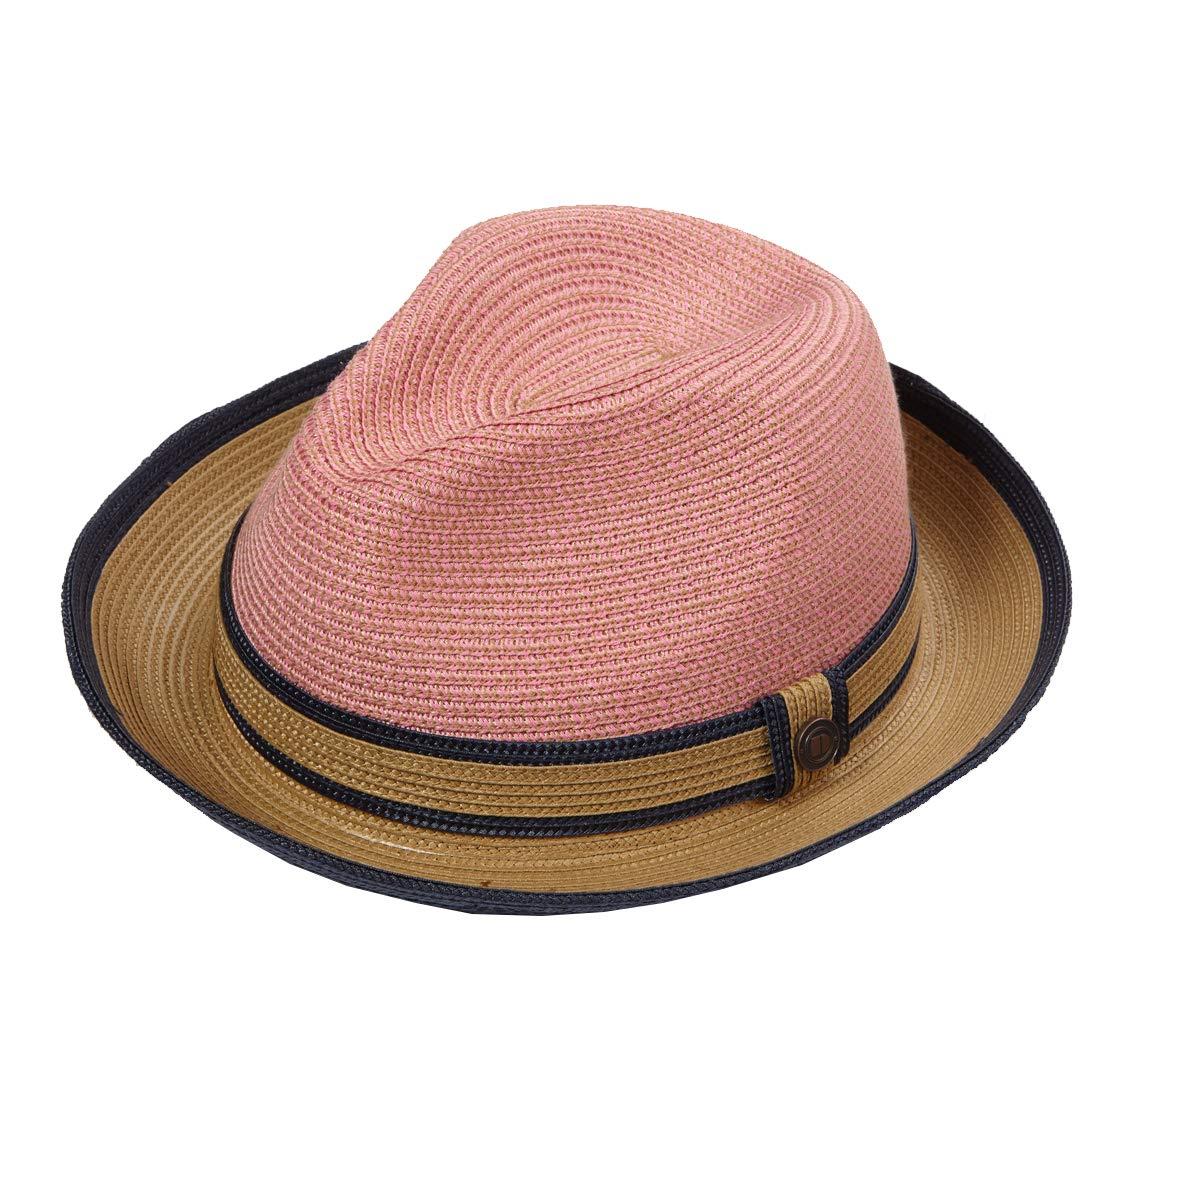 Dasmarca Mens Womens Twotone Summer Straw Fedora Hat - Benson Coral M